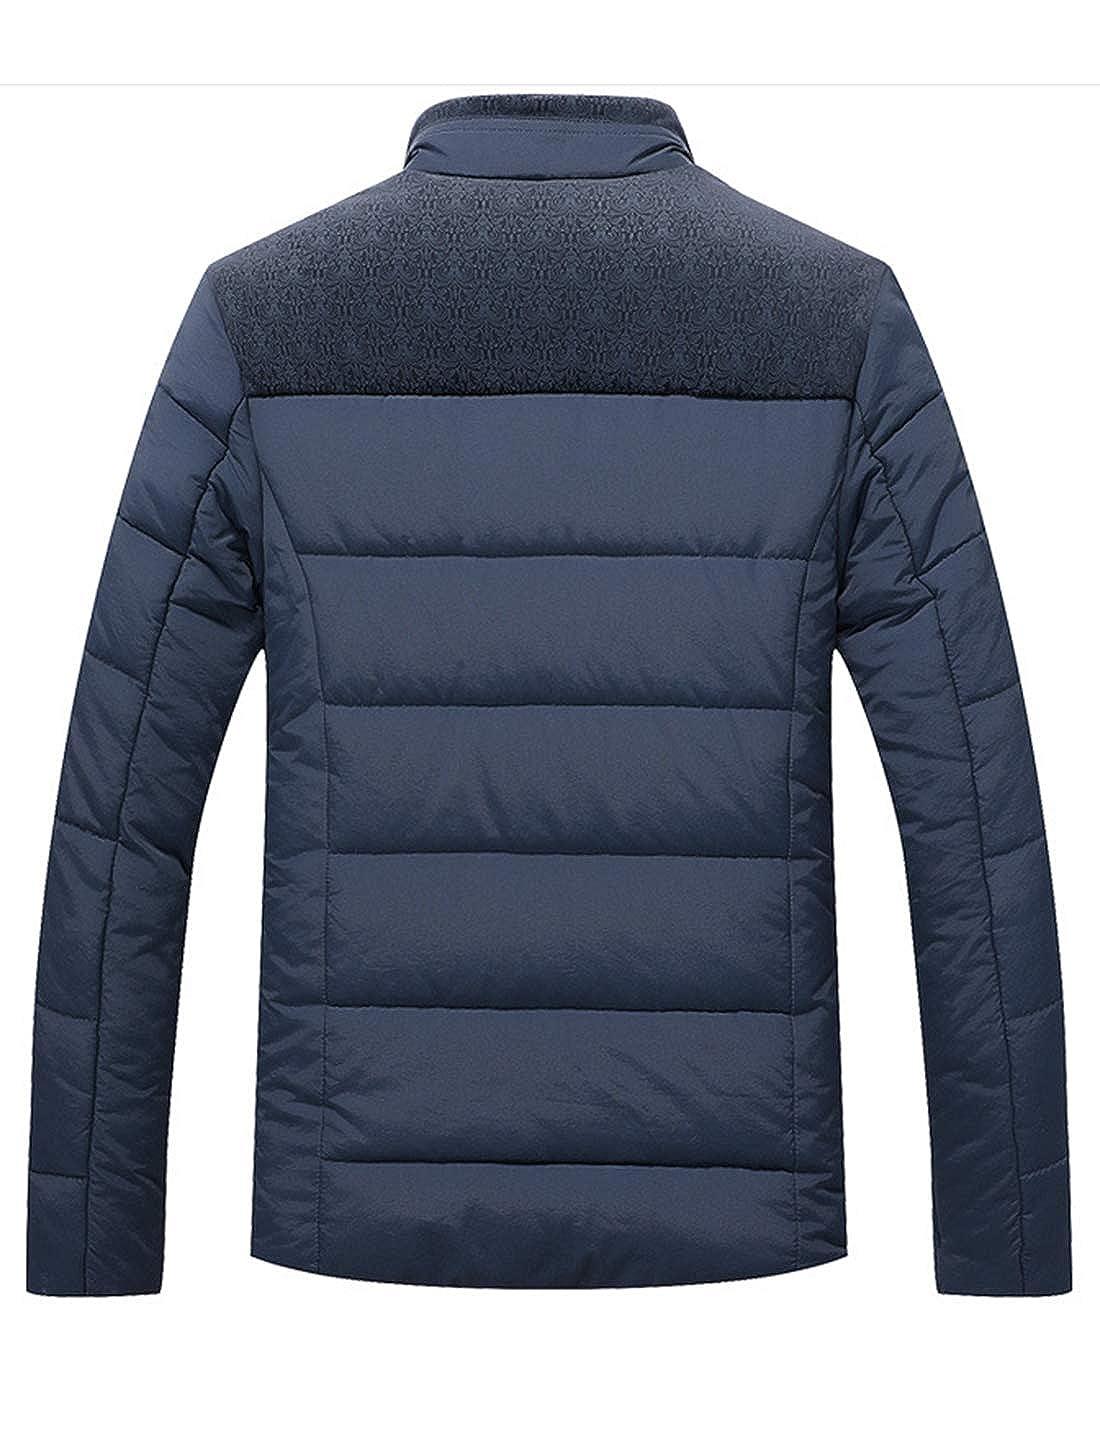 Lentta Mens Business Casual Zip Up Down Cotton Padded Jacket Coat Windbreaker